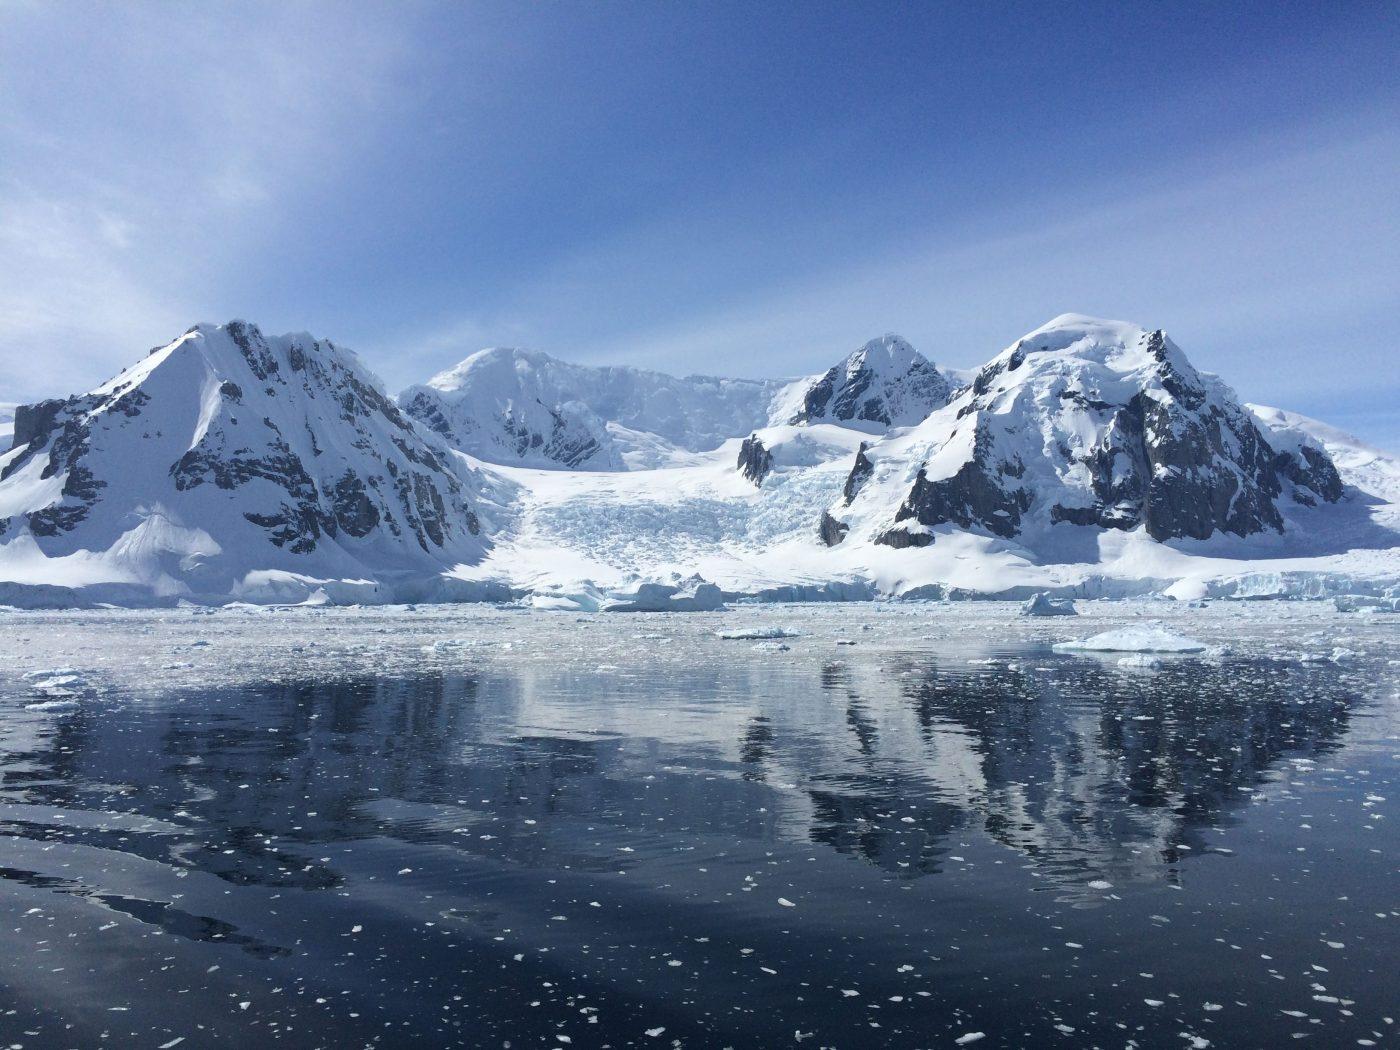 Reasons to visit Antarctica